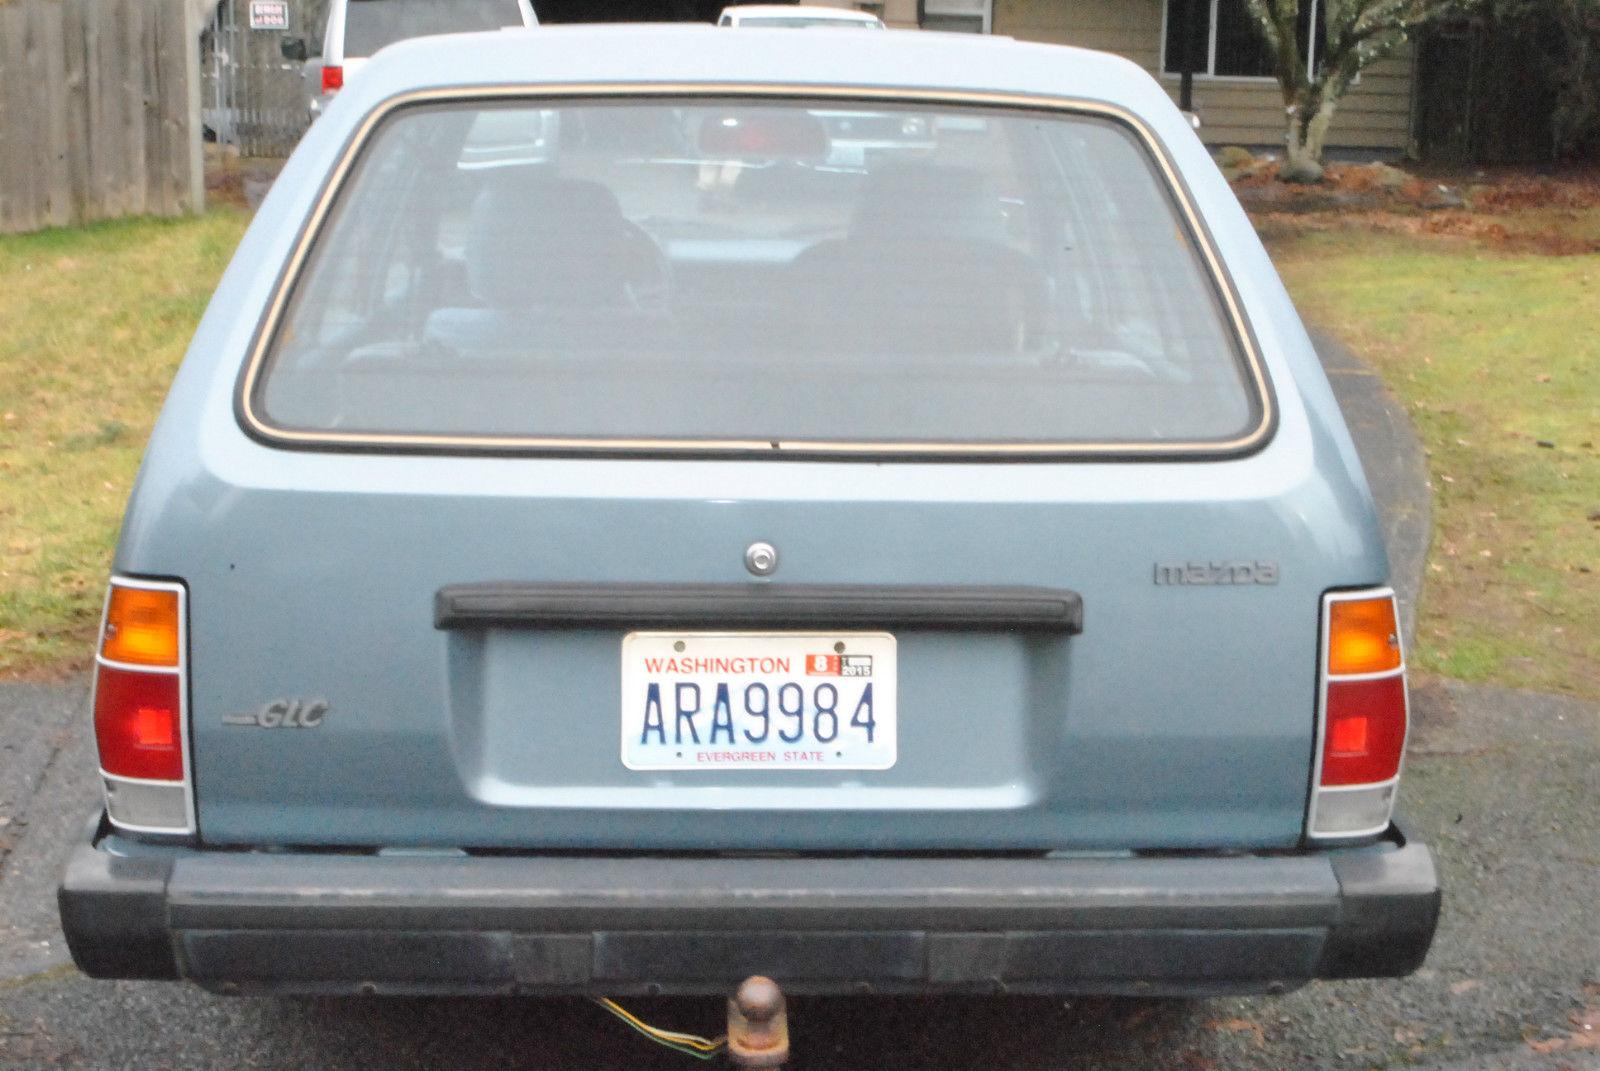 1986 Mazda GLC Wagon 1.5 liter 5 speed - Classic Mazda ...